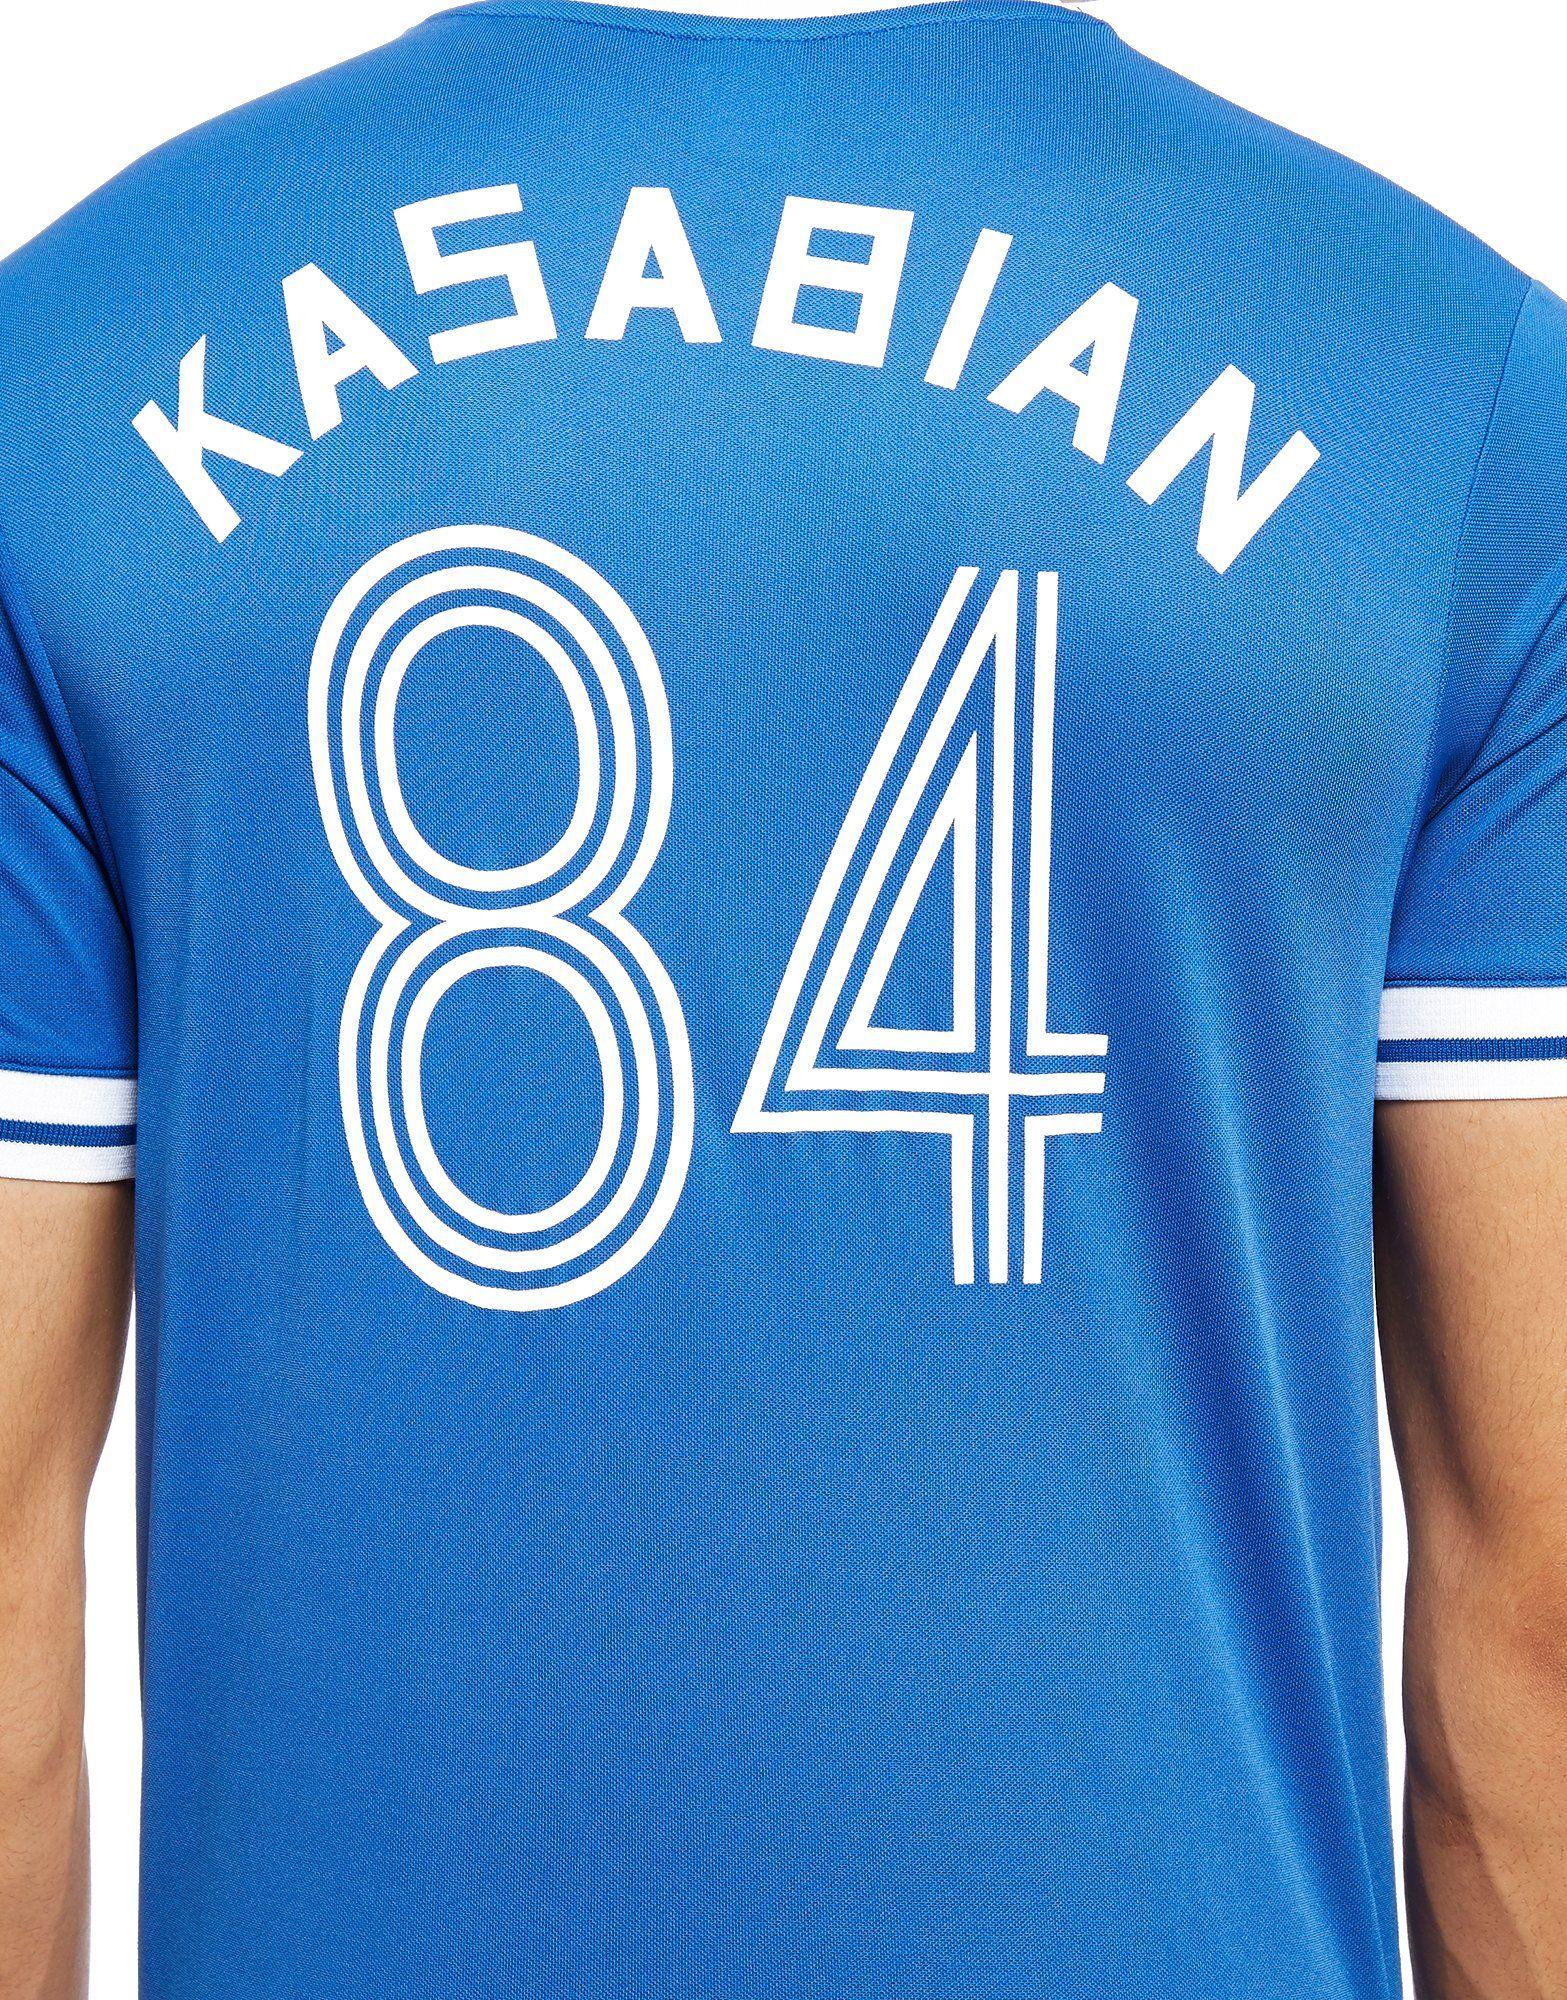 Official Team Official Leicester City Kasabian T-Shirt Blau